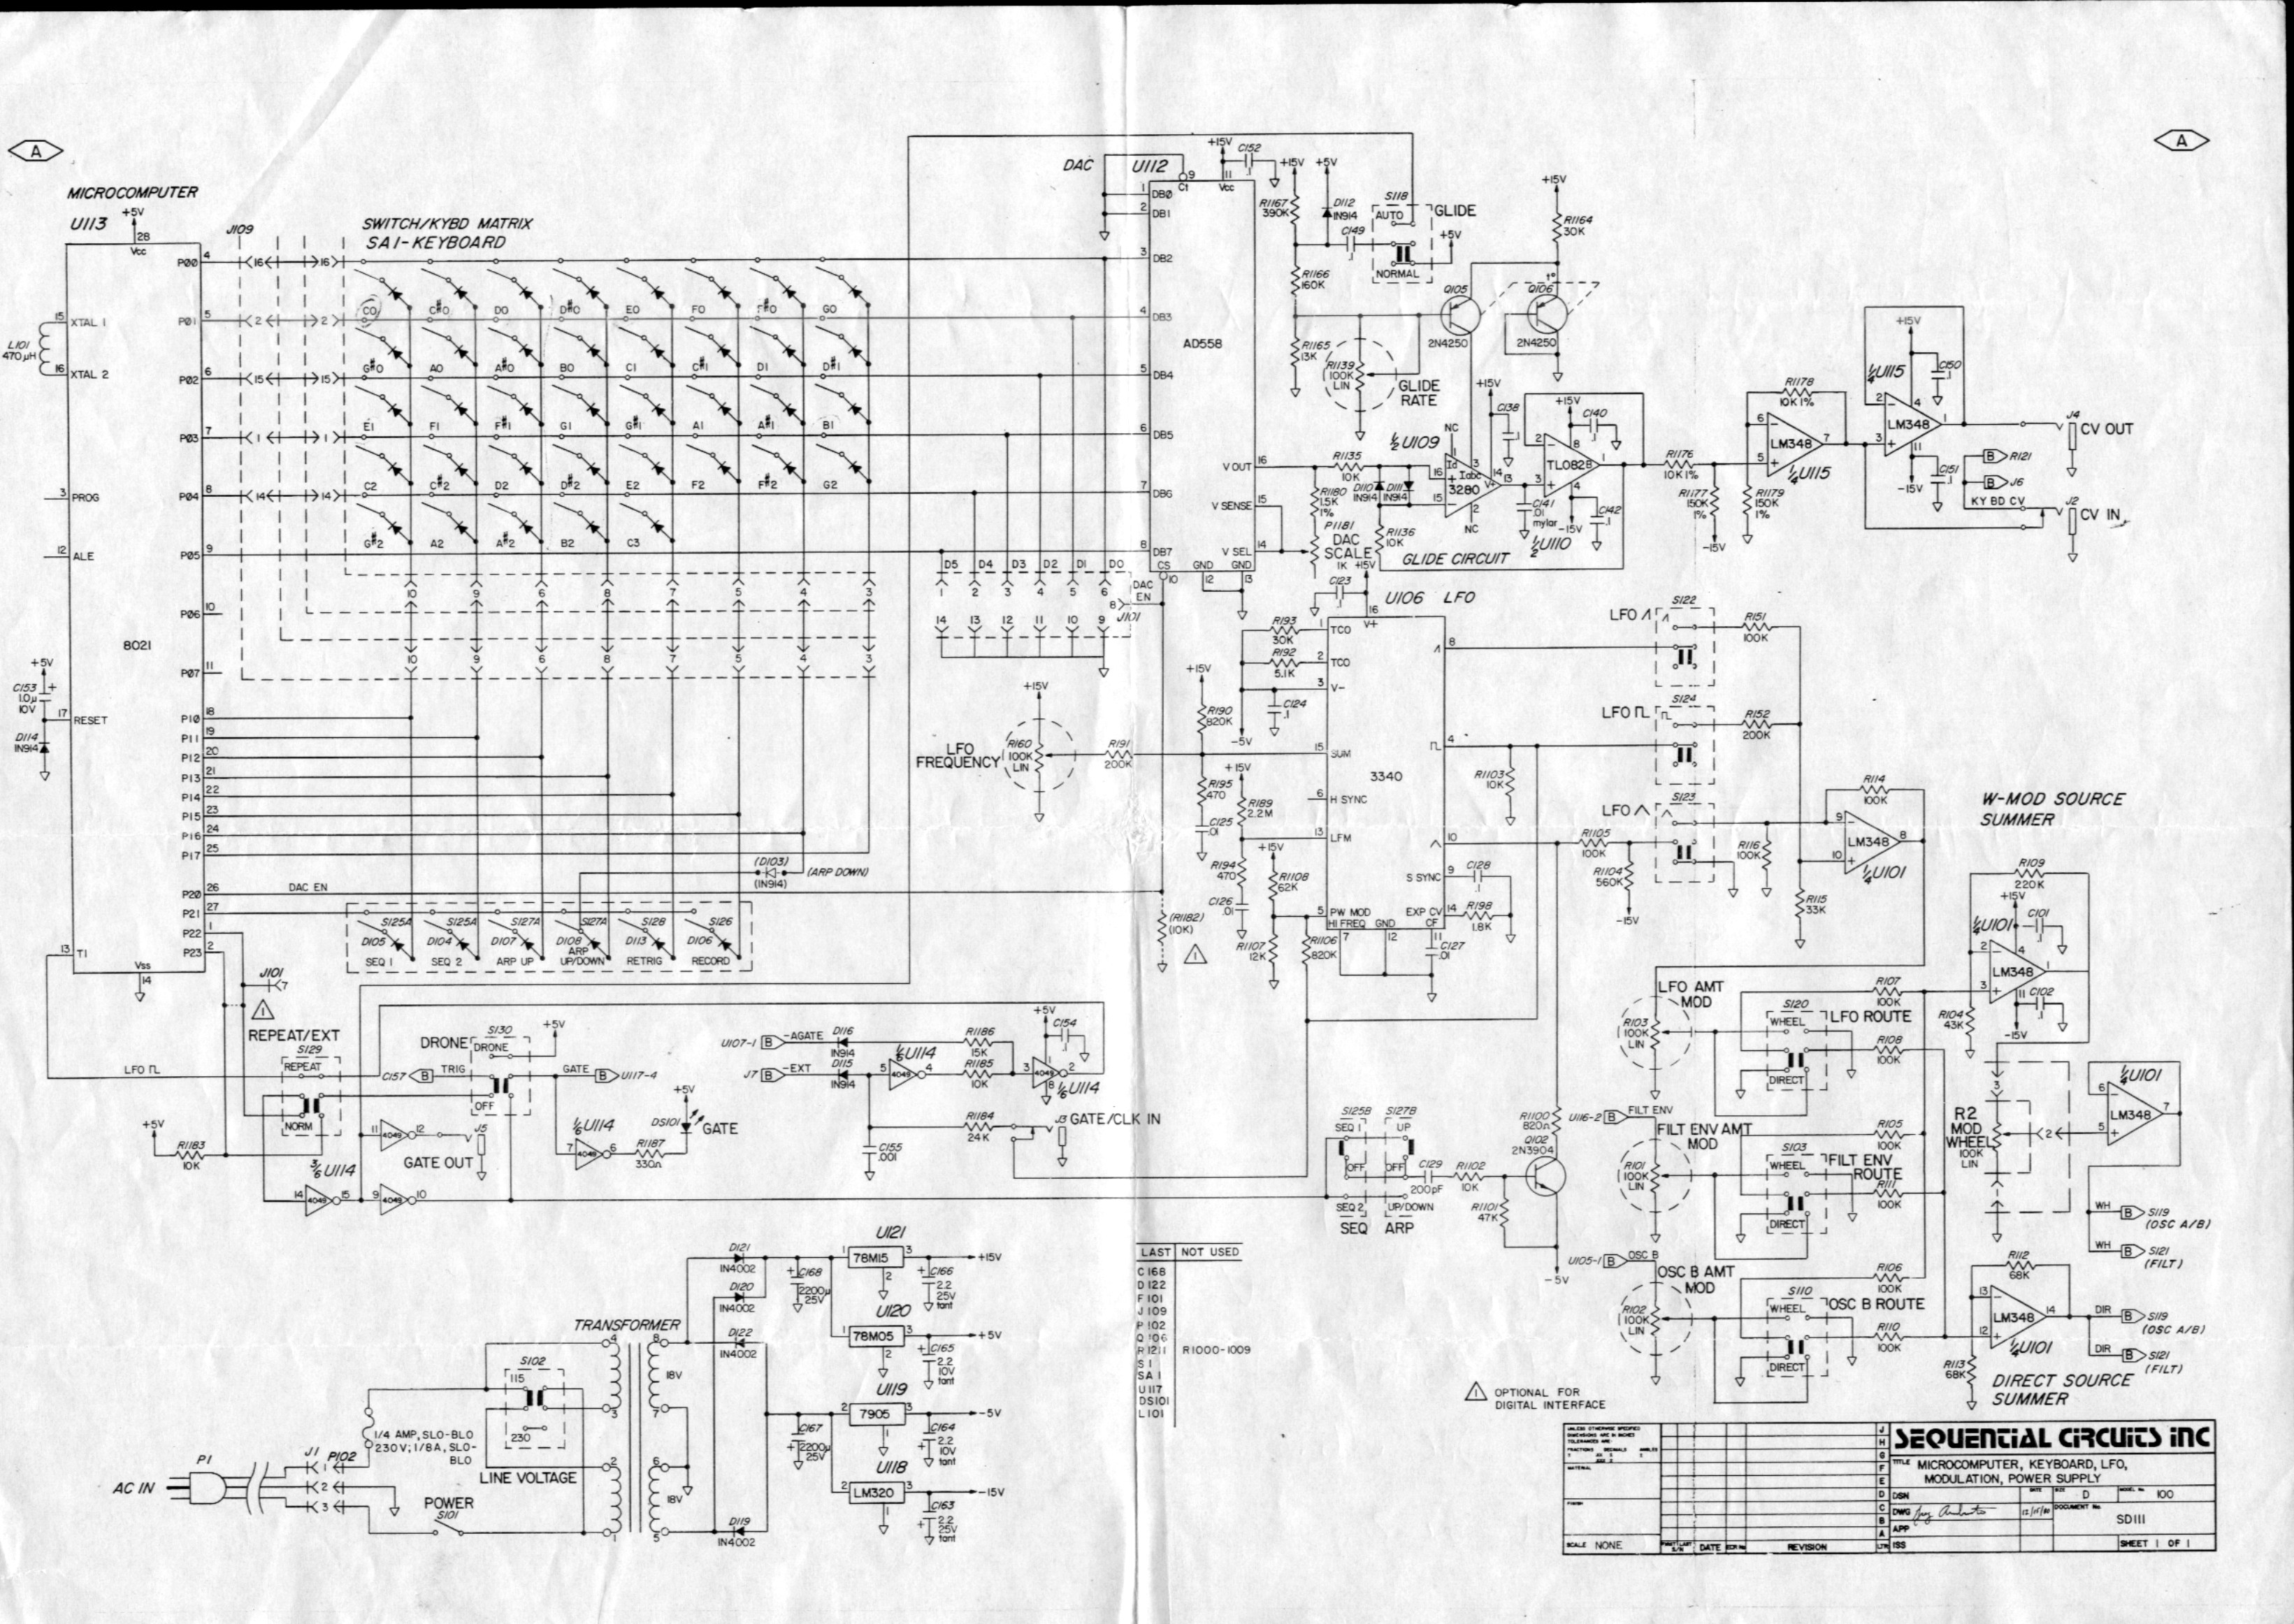 D9 Wiring Diagram Auto Electrical 3204 Cat Engine Cerwin Vega B2